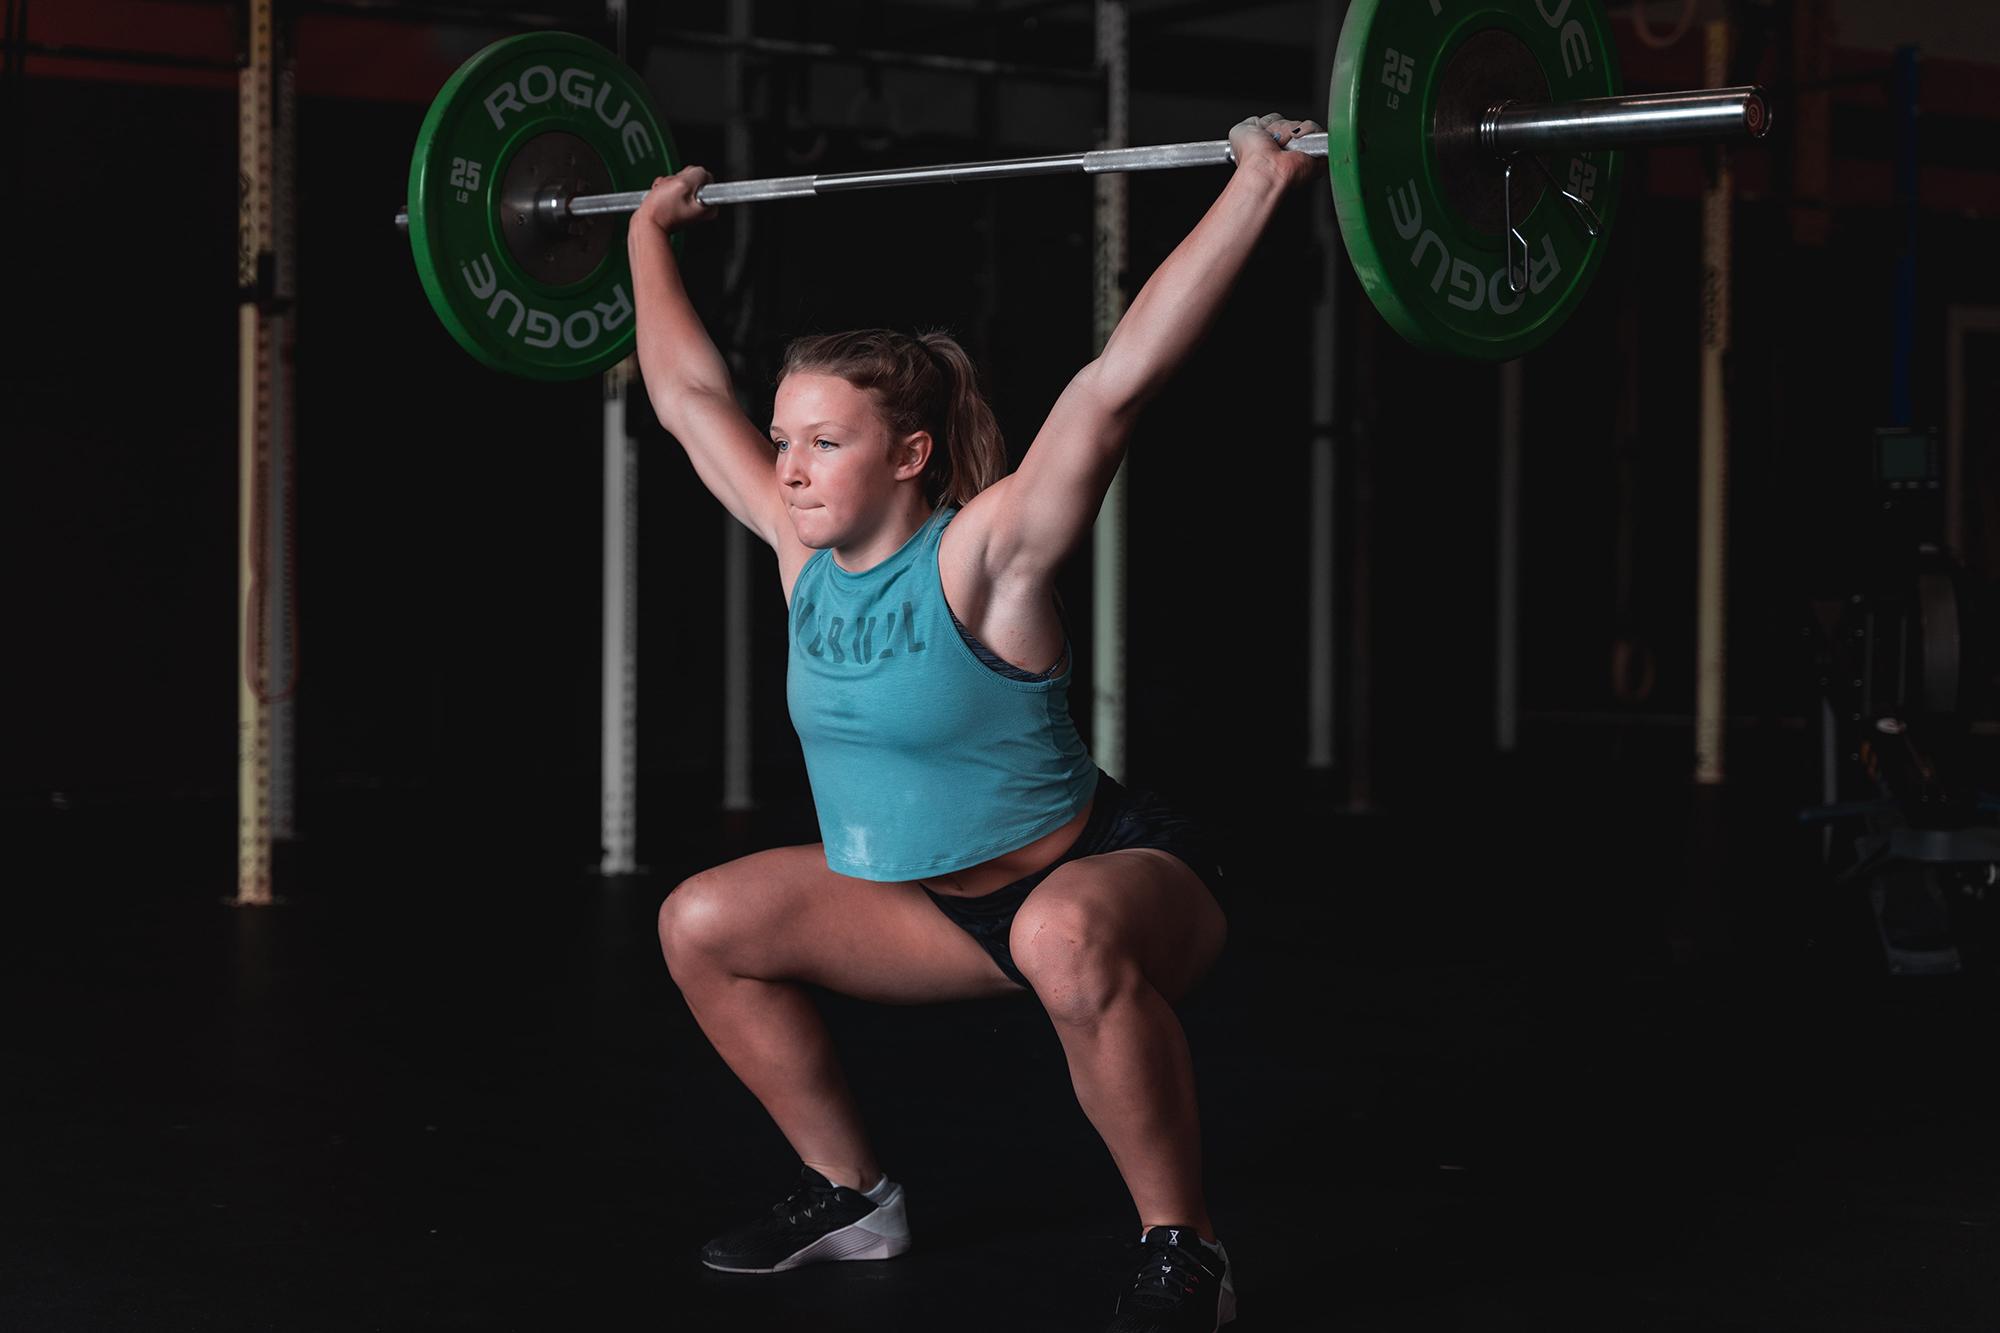 teen girl lifting weights, demonstrating teen fitness